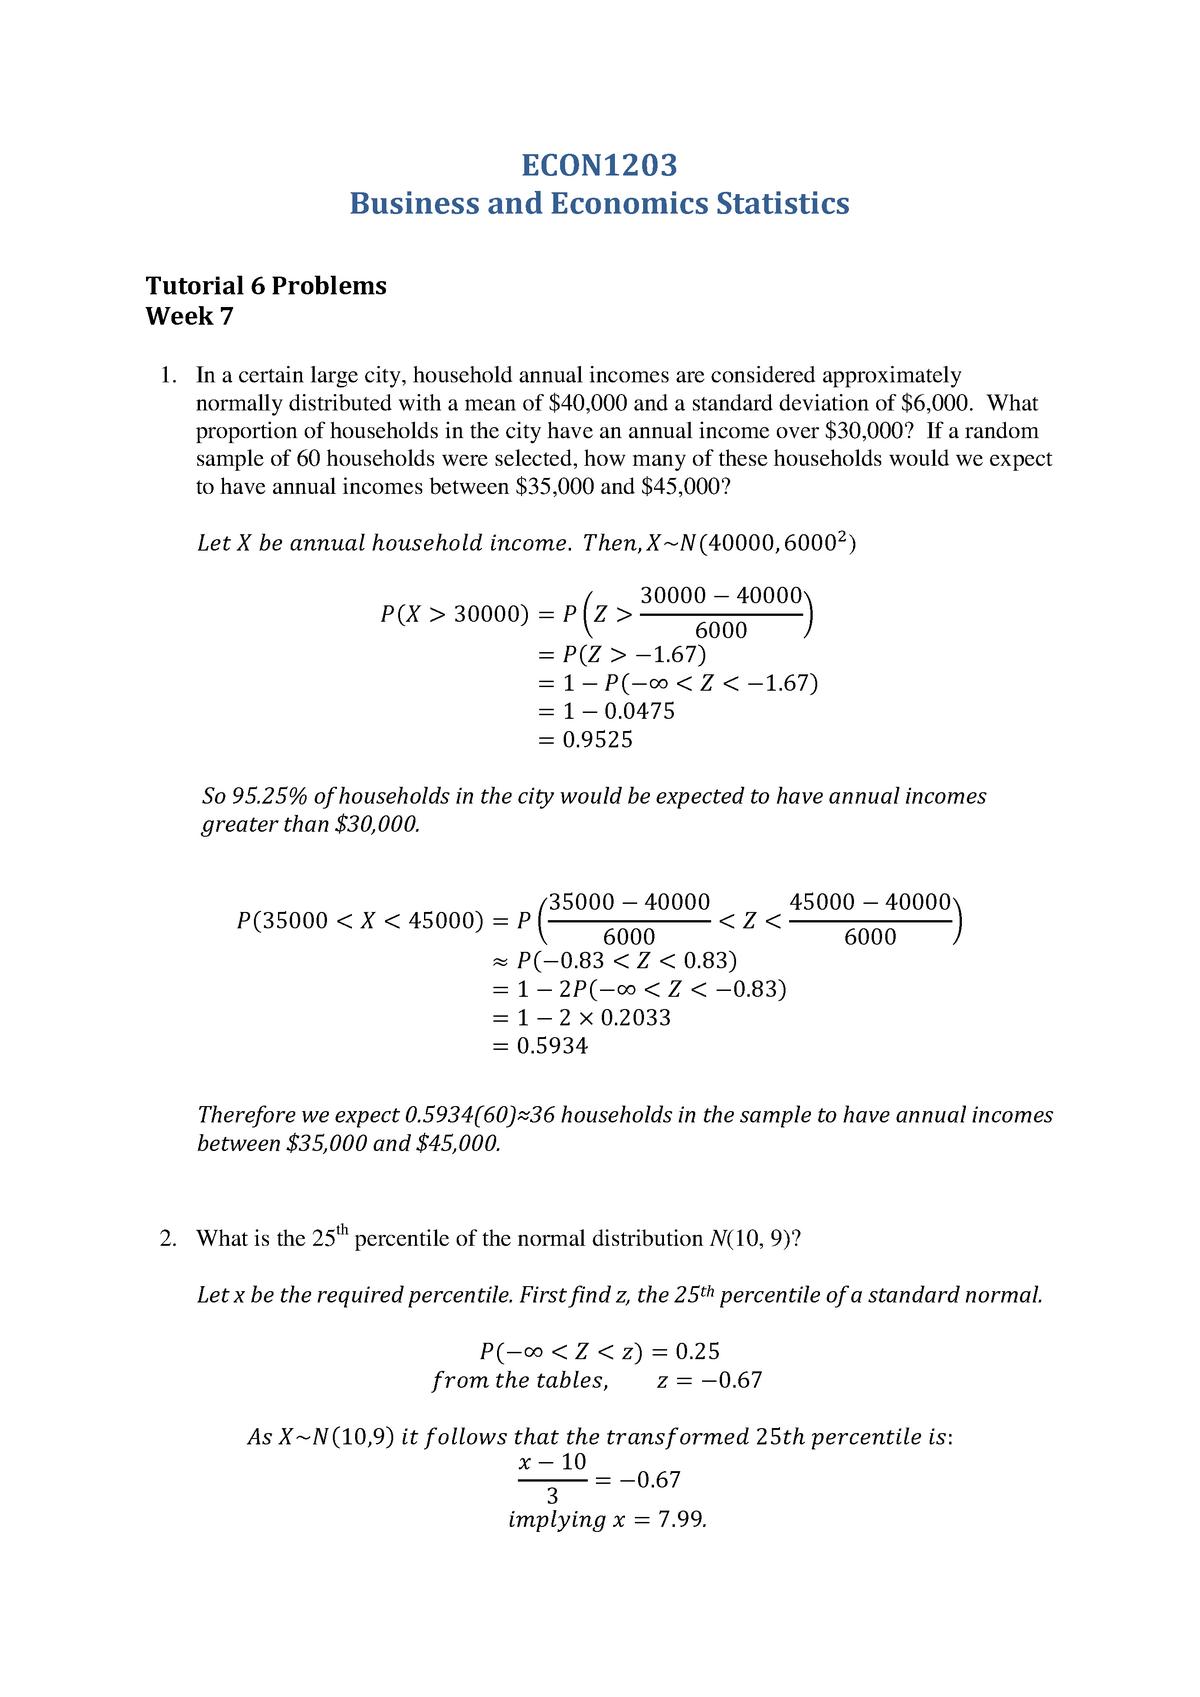 Tutorial 6 (Week 7) solutions - ECON1203 - UNSW - StuDocu